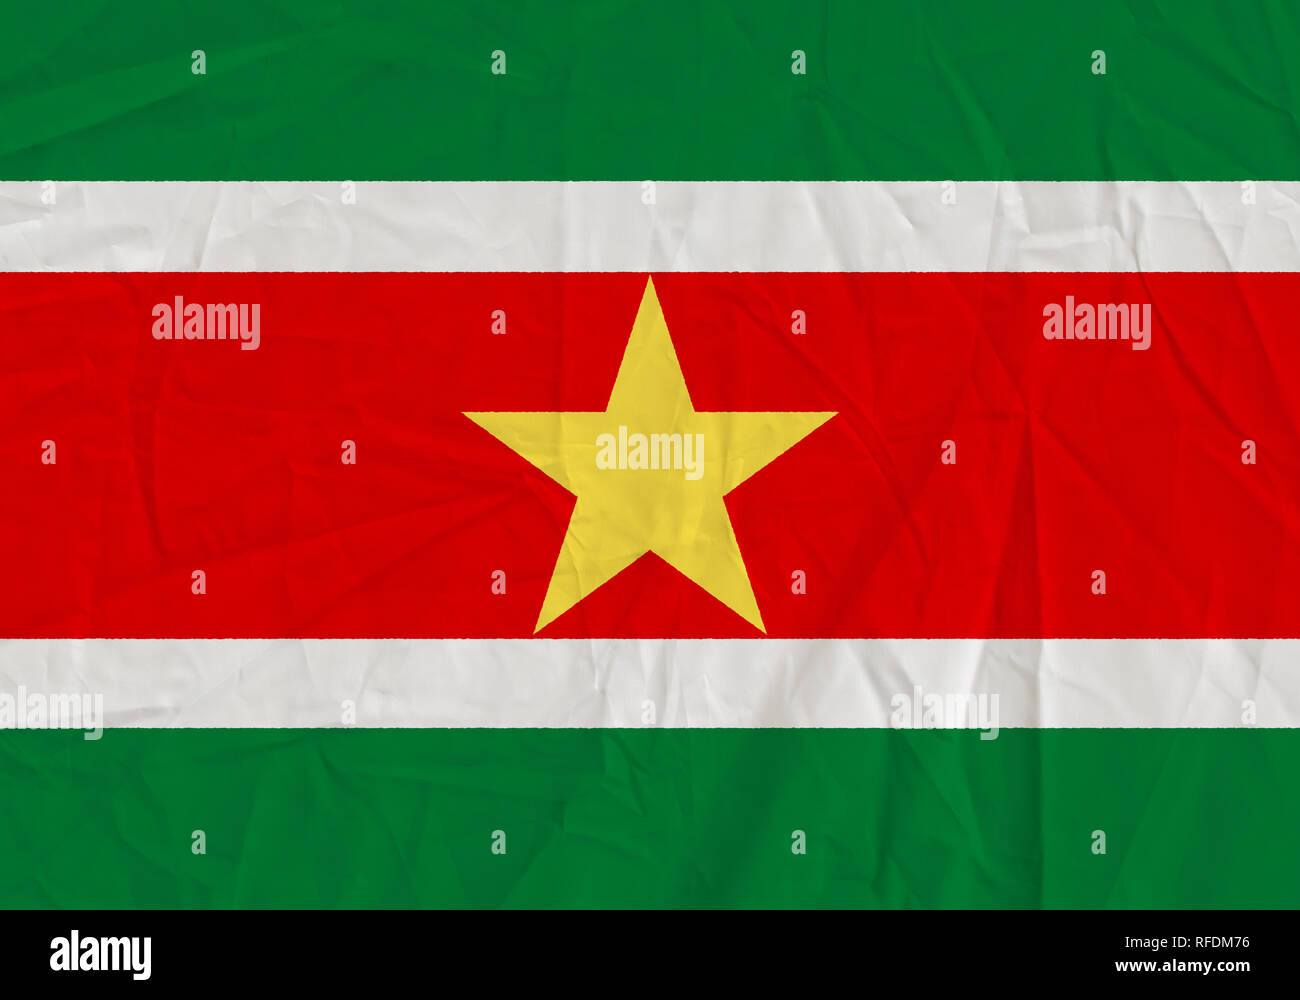 Suriname grunge flag. Patriotic background. National flag of Suriname - Stock Image